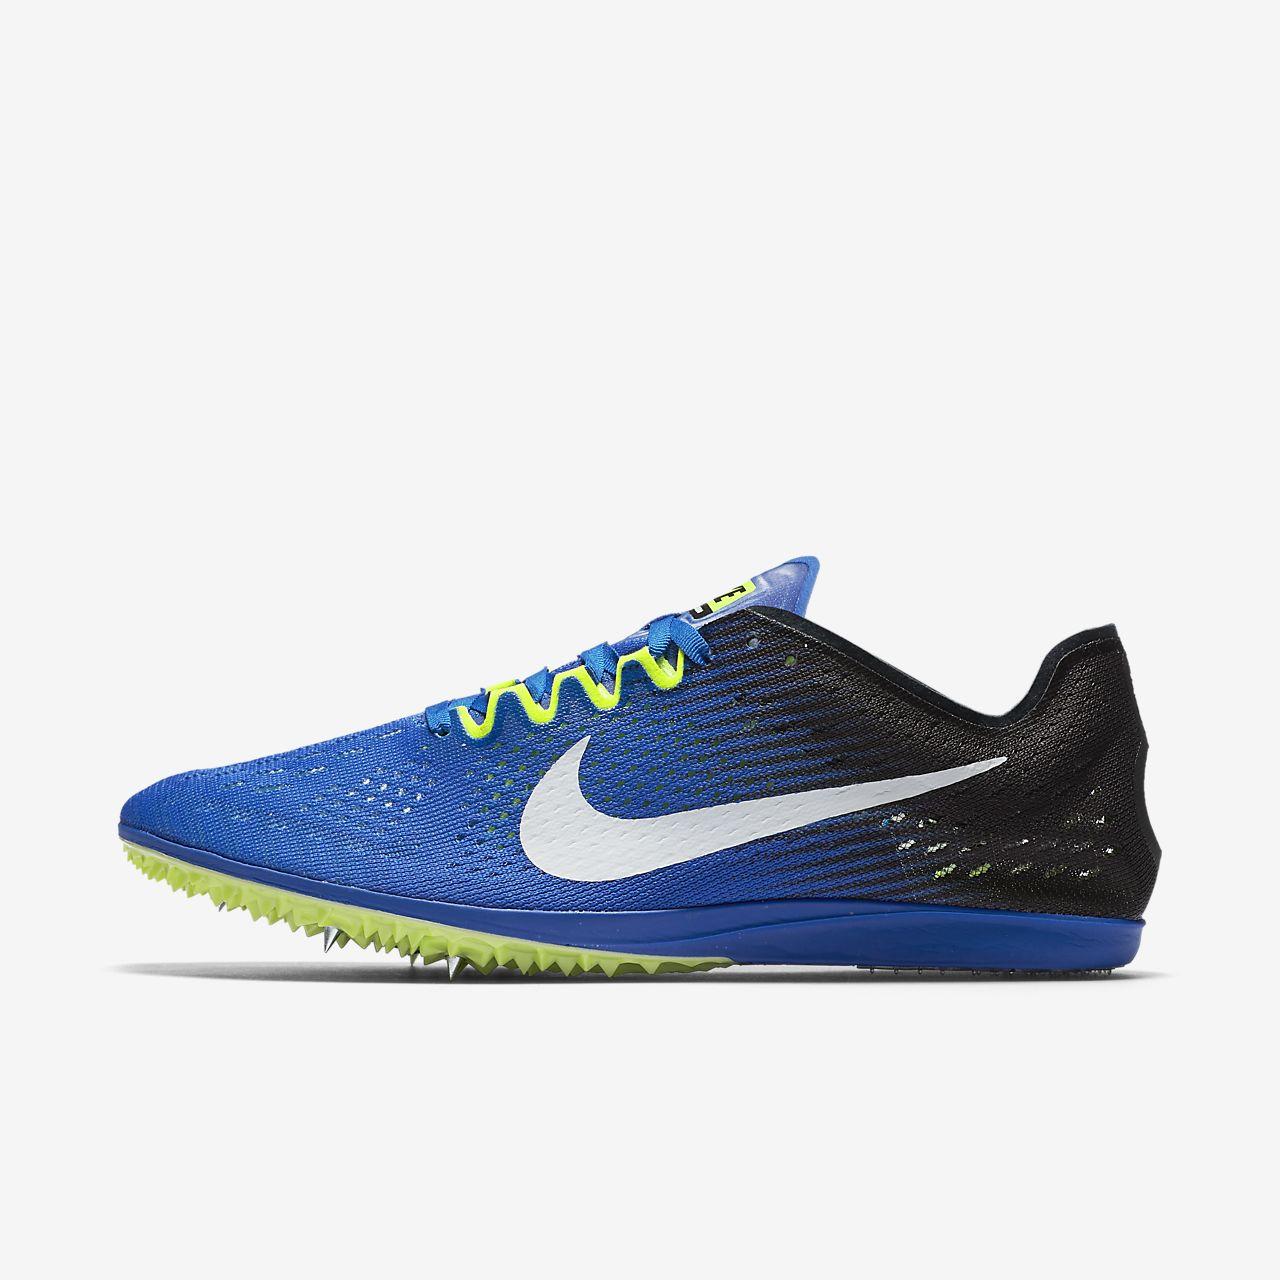 reputable site 3c183 dea5b ... Nike Zoom Matumbo 3 Unisex Distance Spike